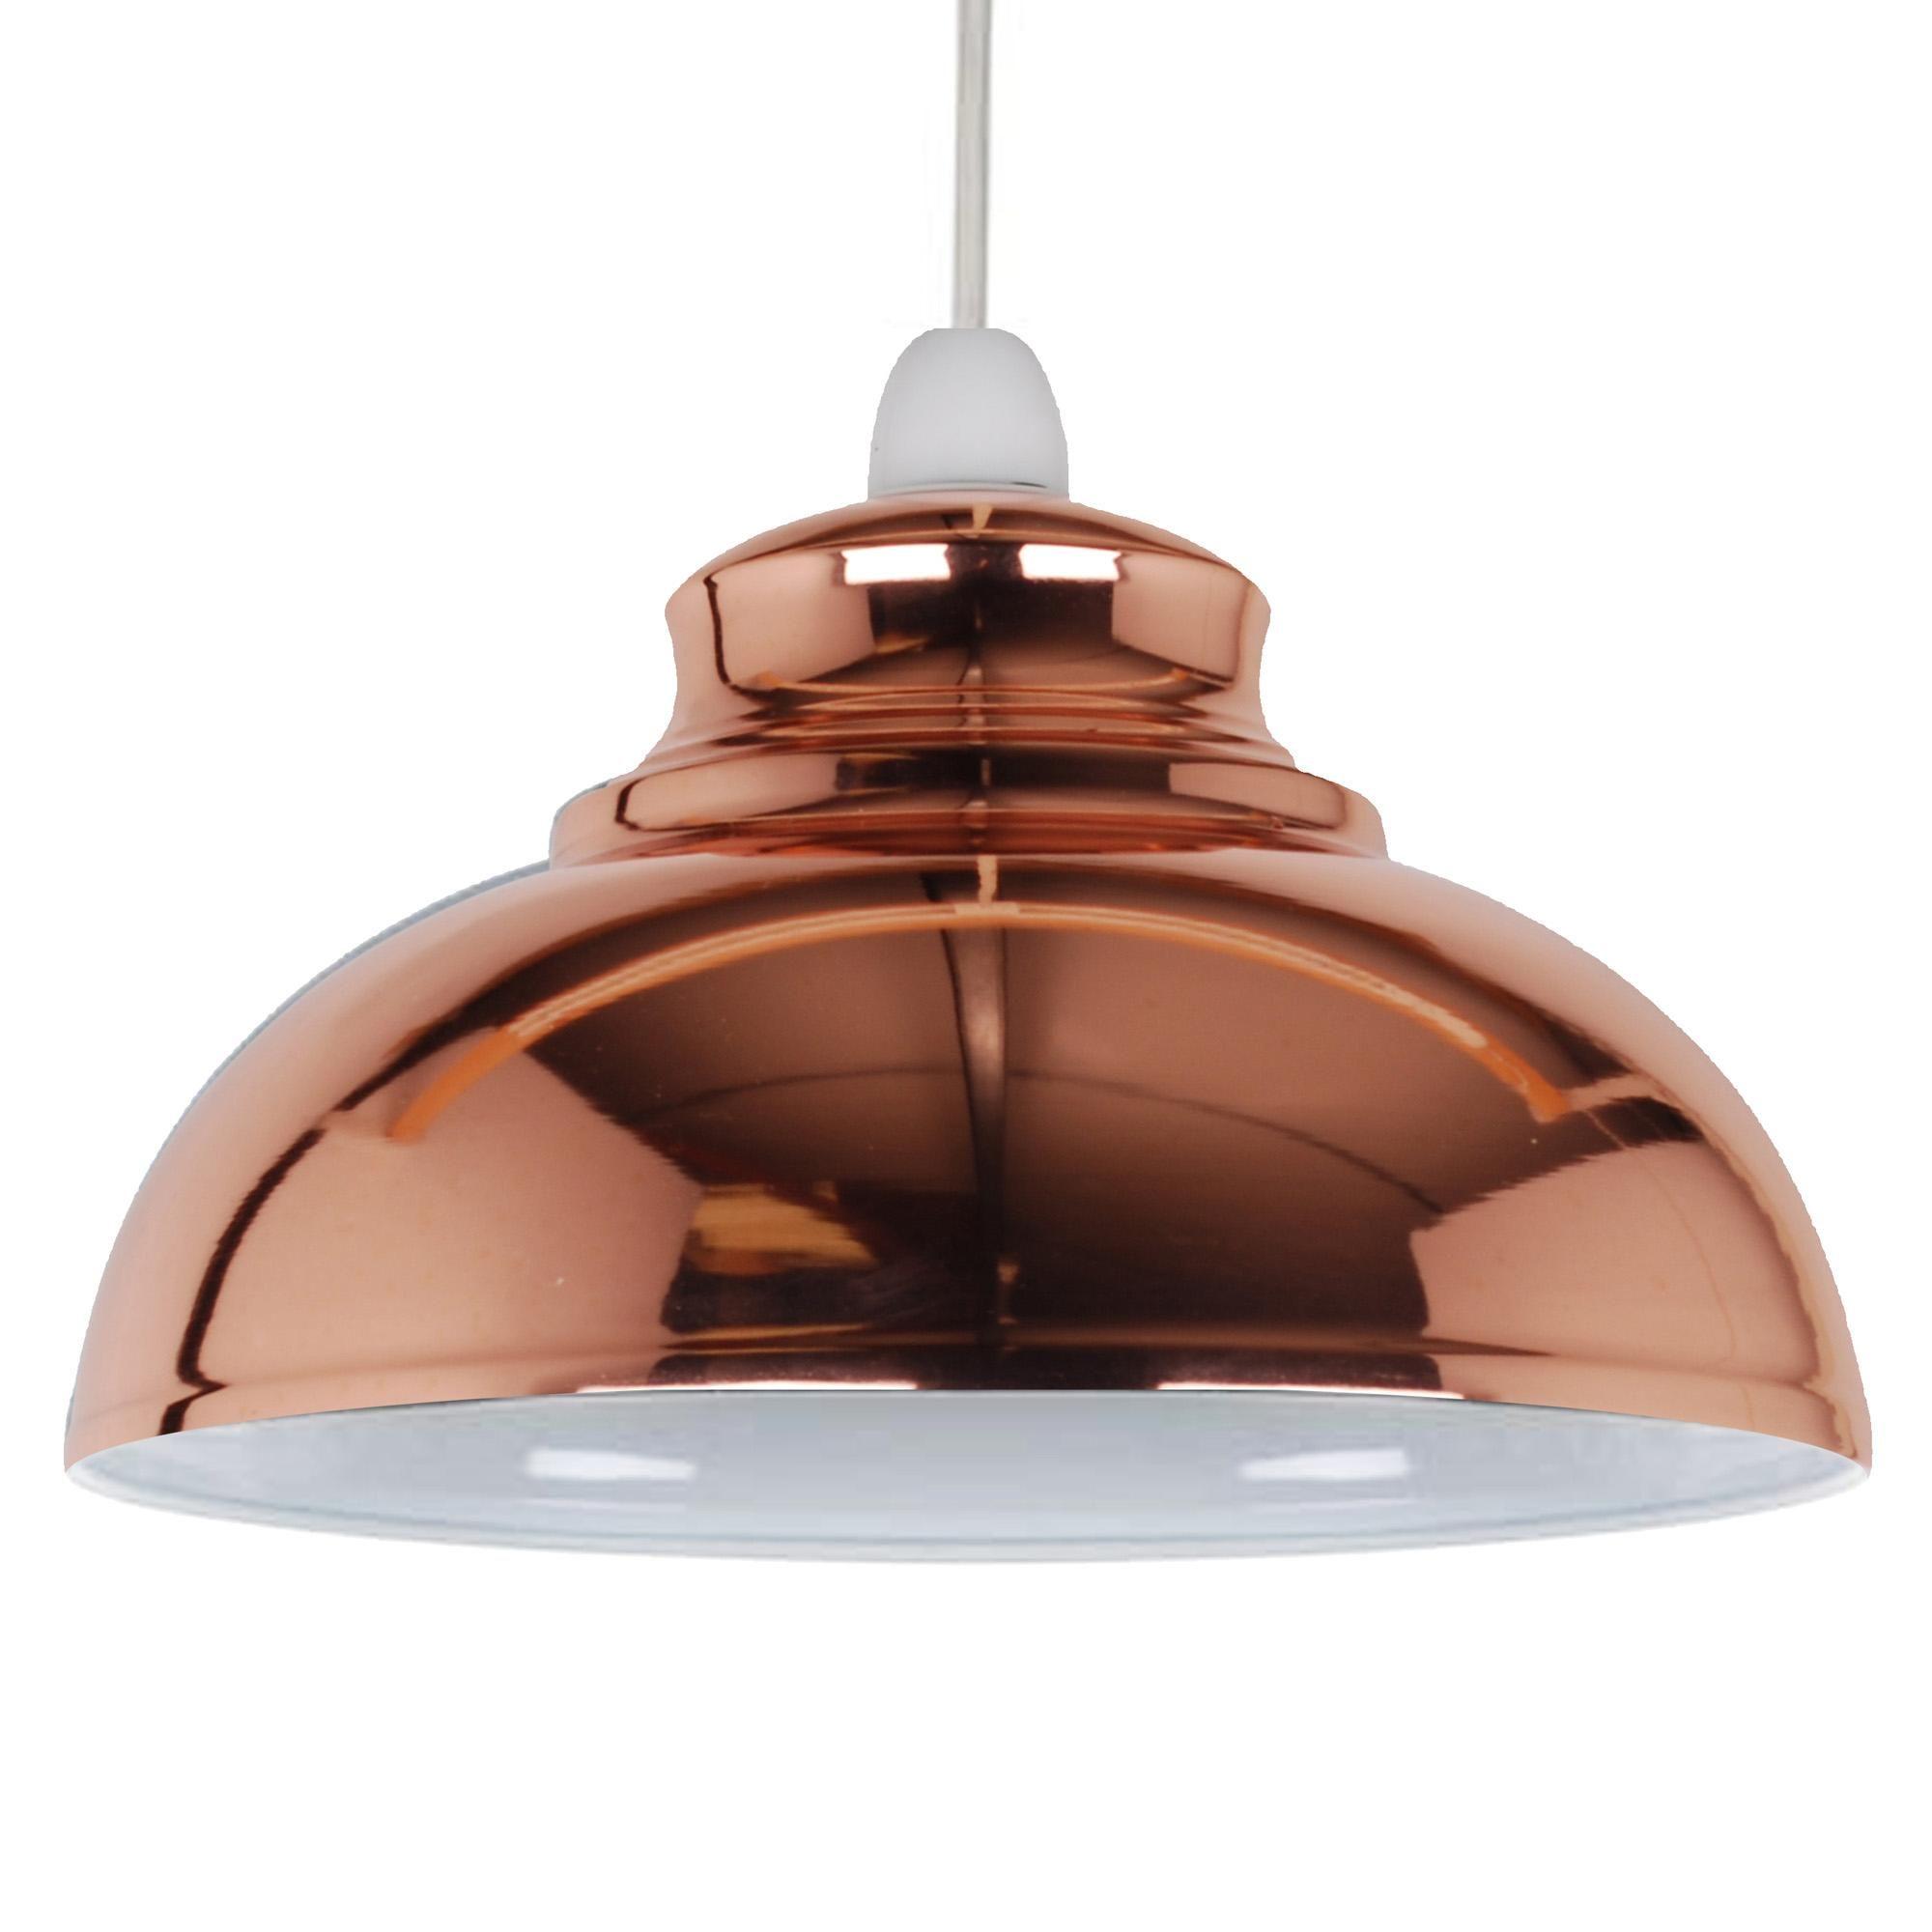 Pantone Colors: Copper Tan Design and Inspirations | Pendant Lights ...